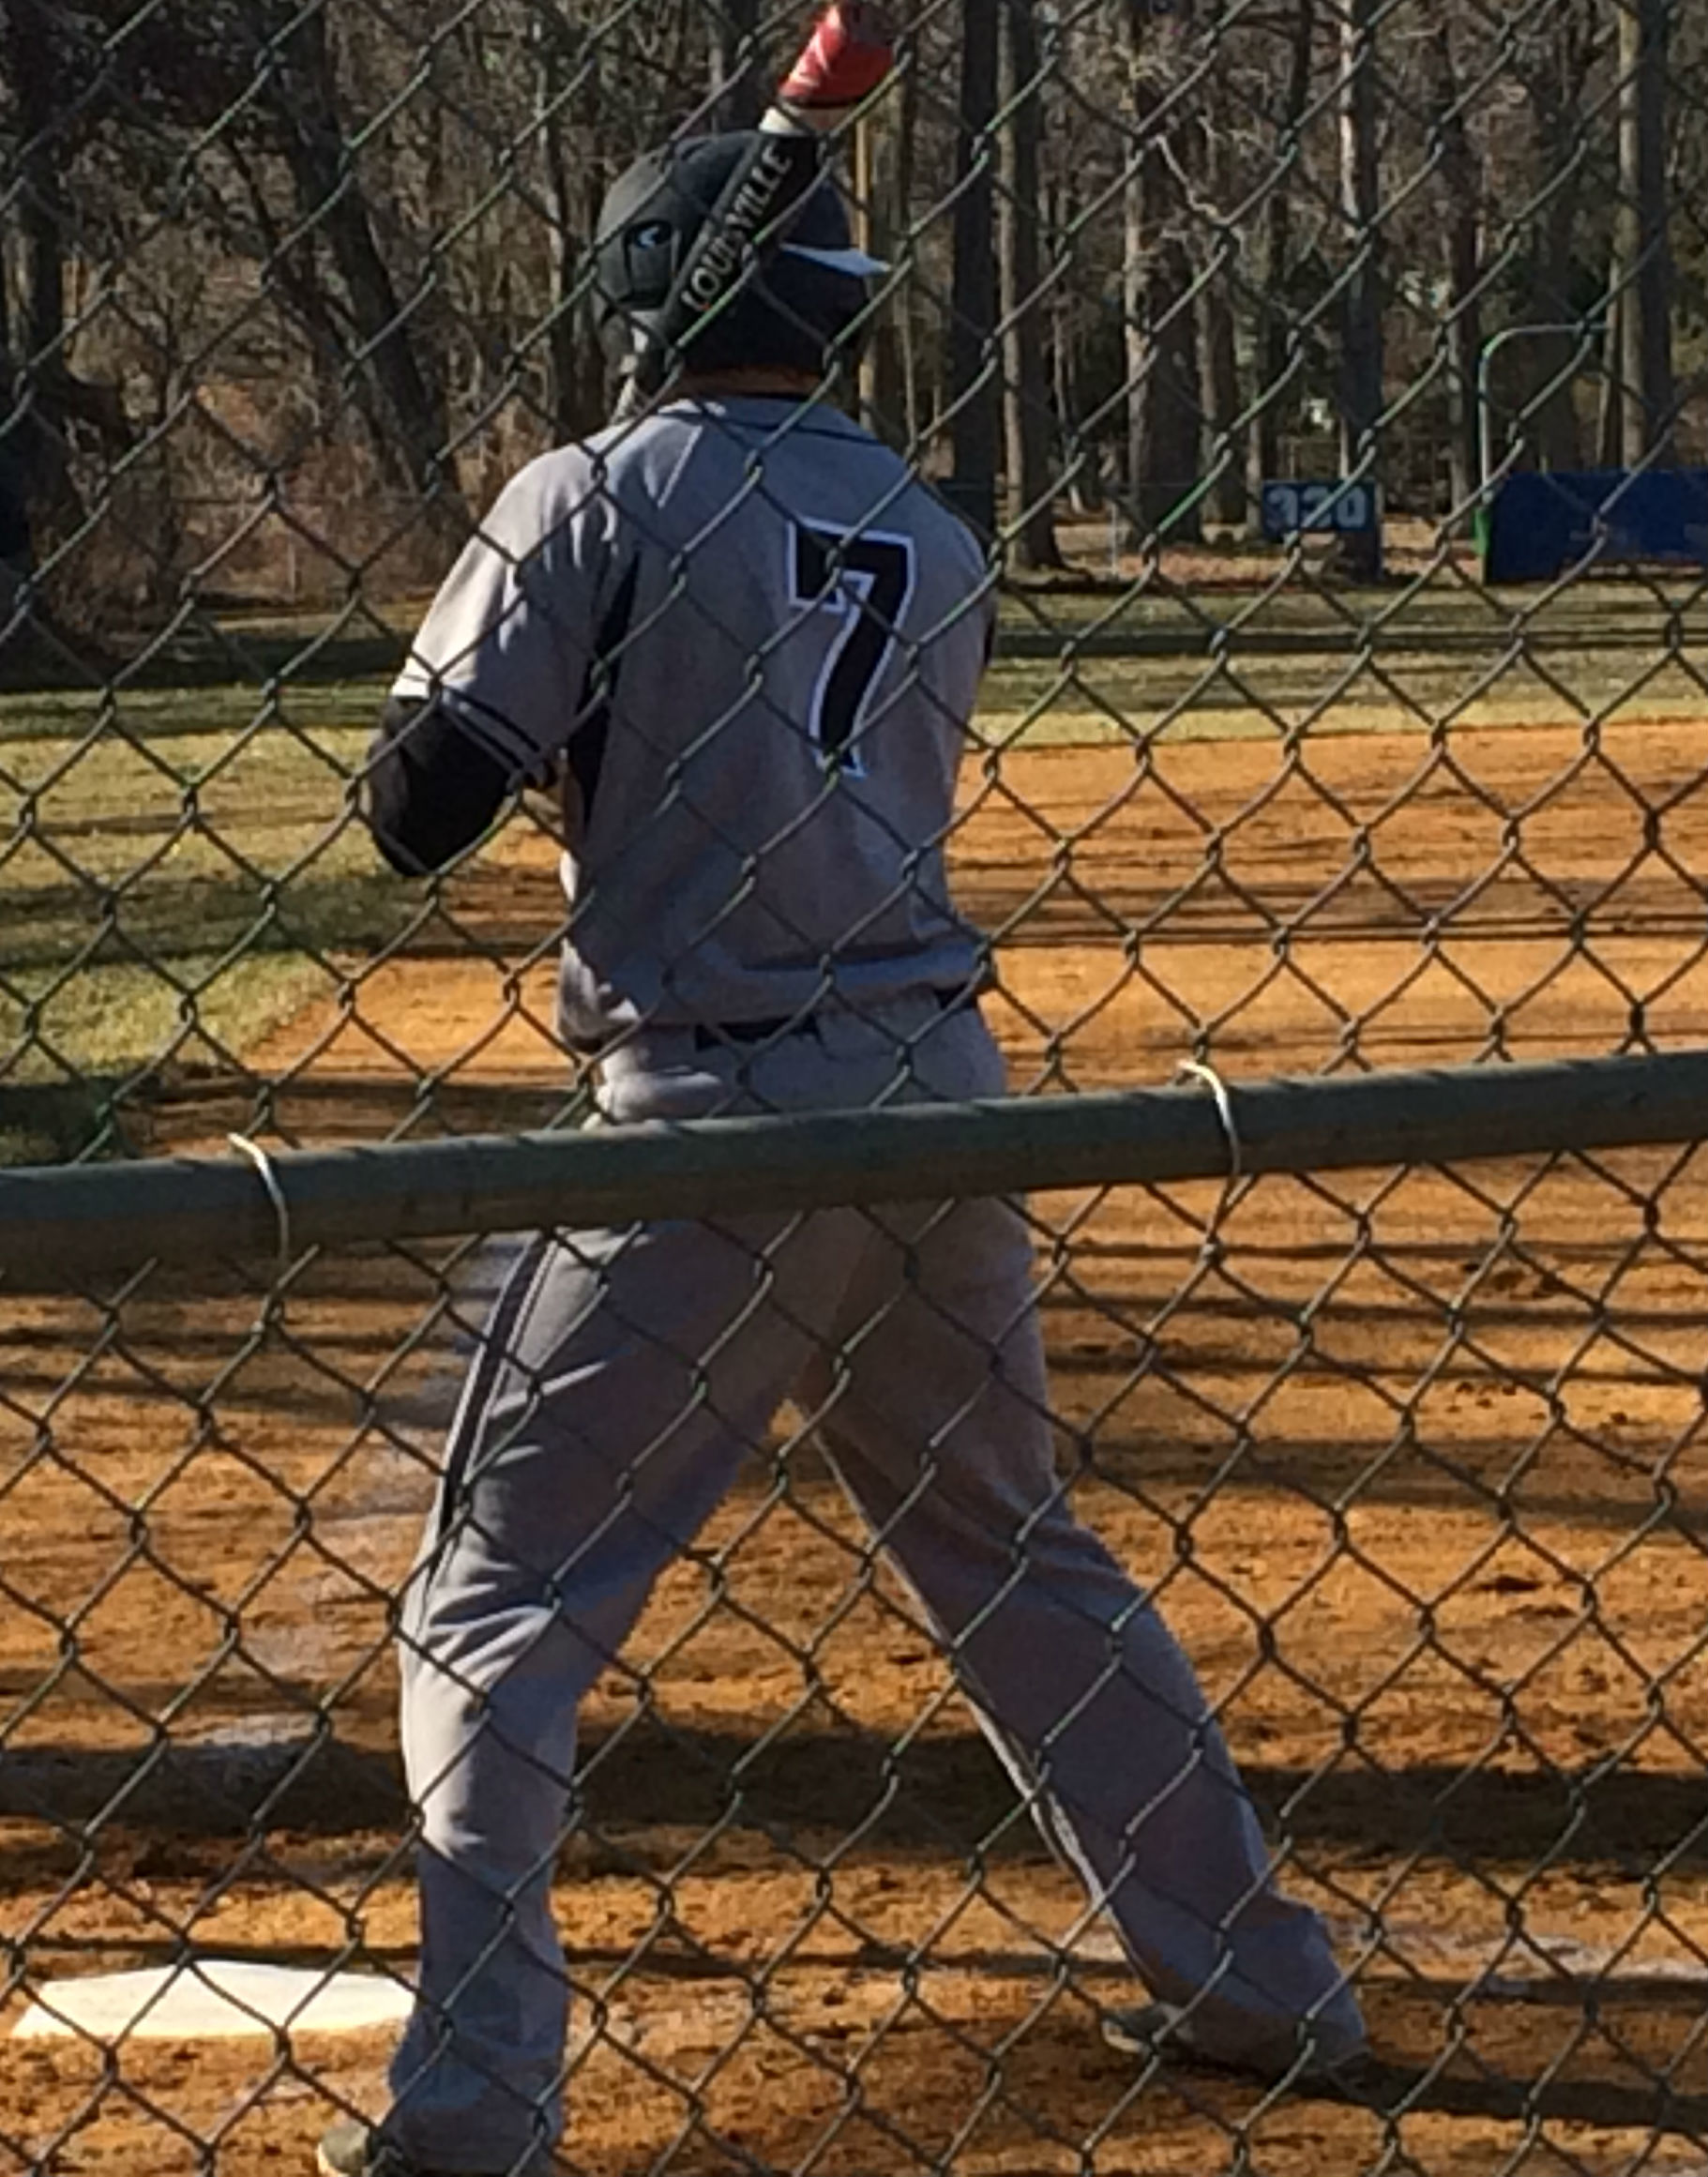 7c9dedfbeca3284f5b29_ALJ-Dayton_Baseball_A.jpg